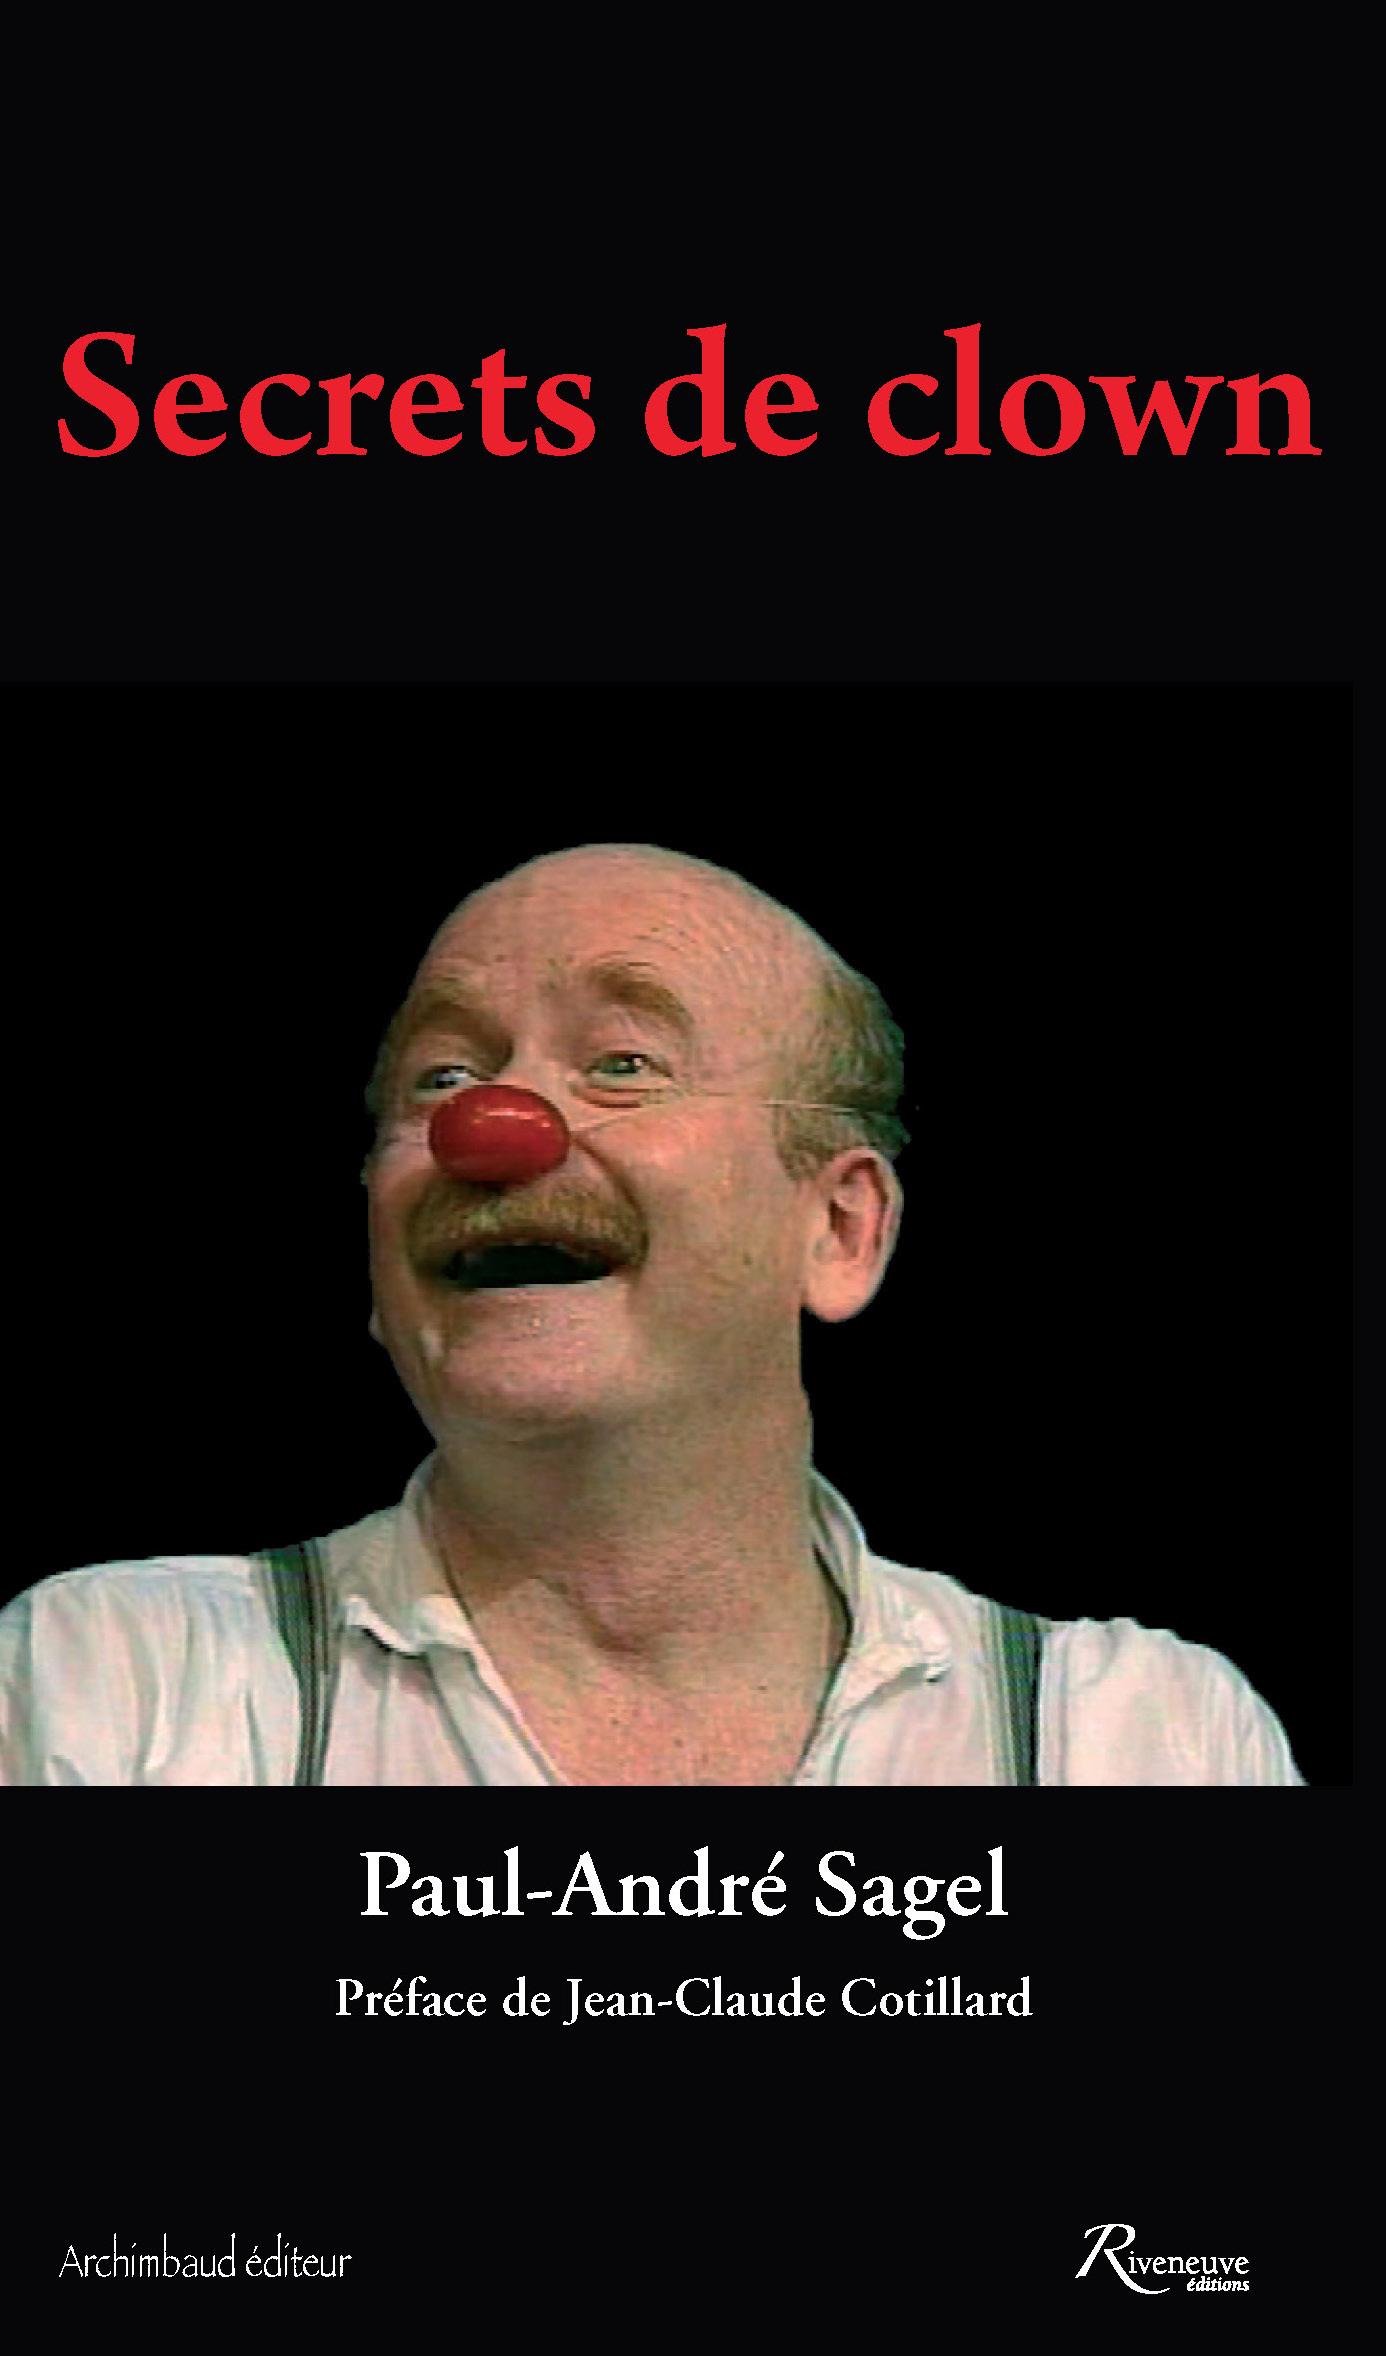 Secrets de clown